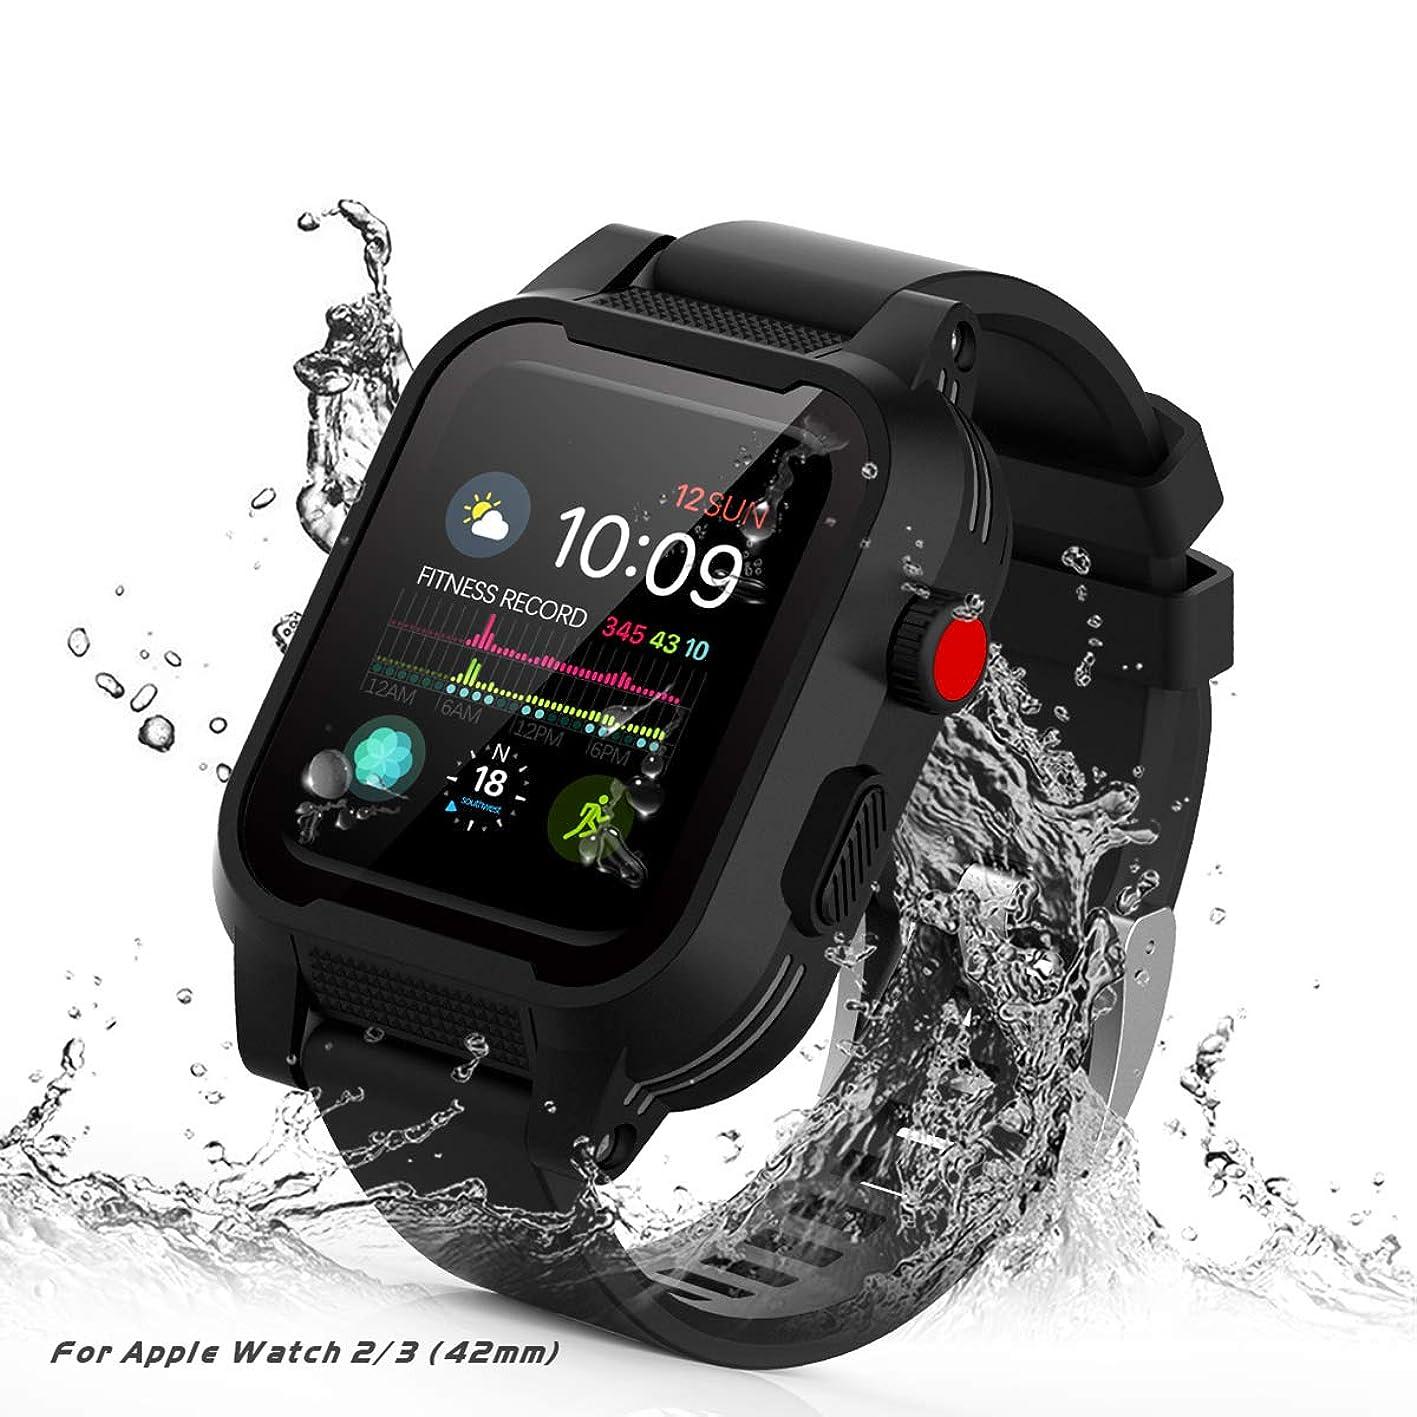 [Waterproof Case for 42mm] AIUERU Waterproof Apple Watch Case with Resilient Shock Absorption for 42mm Apple Watch Series 3 / Series2 / with 2 Soft Silicone Watch Band - Black jrmhhvapnlg621